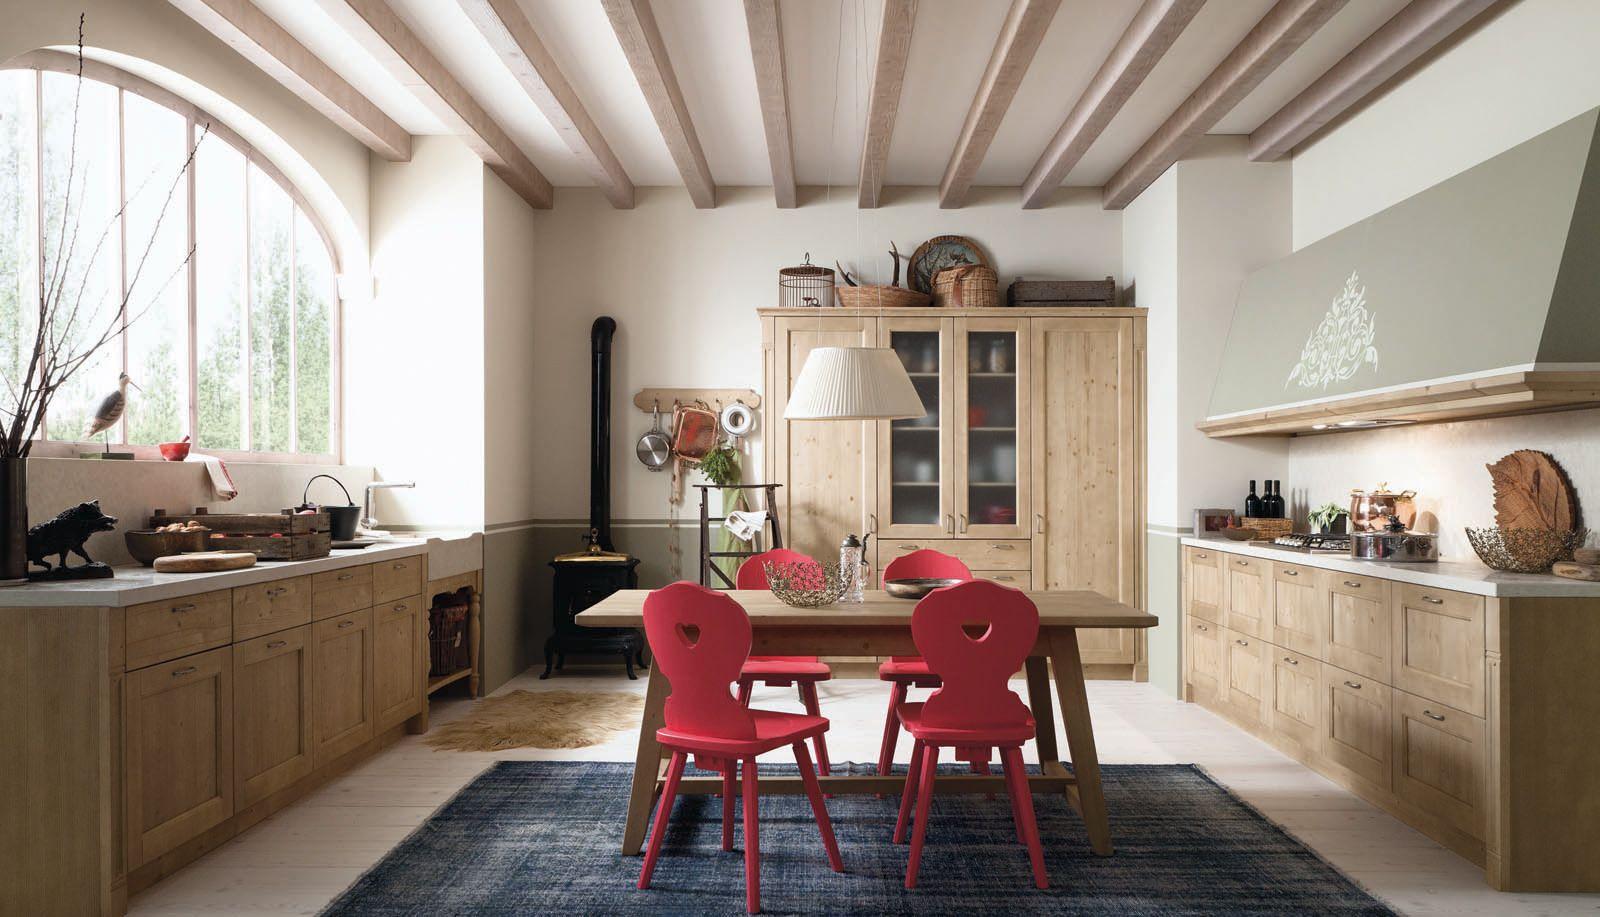 Best Tavoli E Sedie Per Cucina Contemporary - Ideas & Design 2017 ...